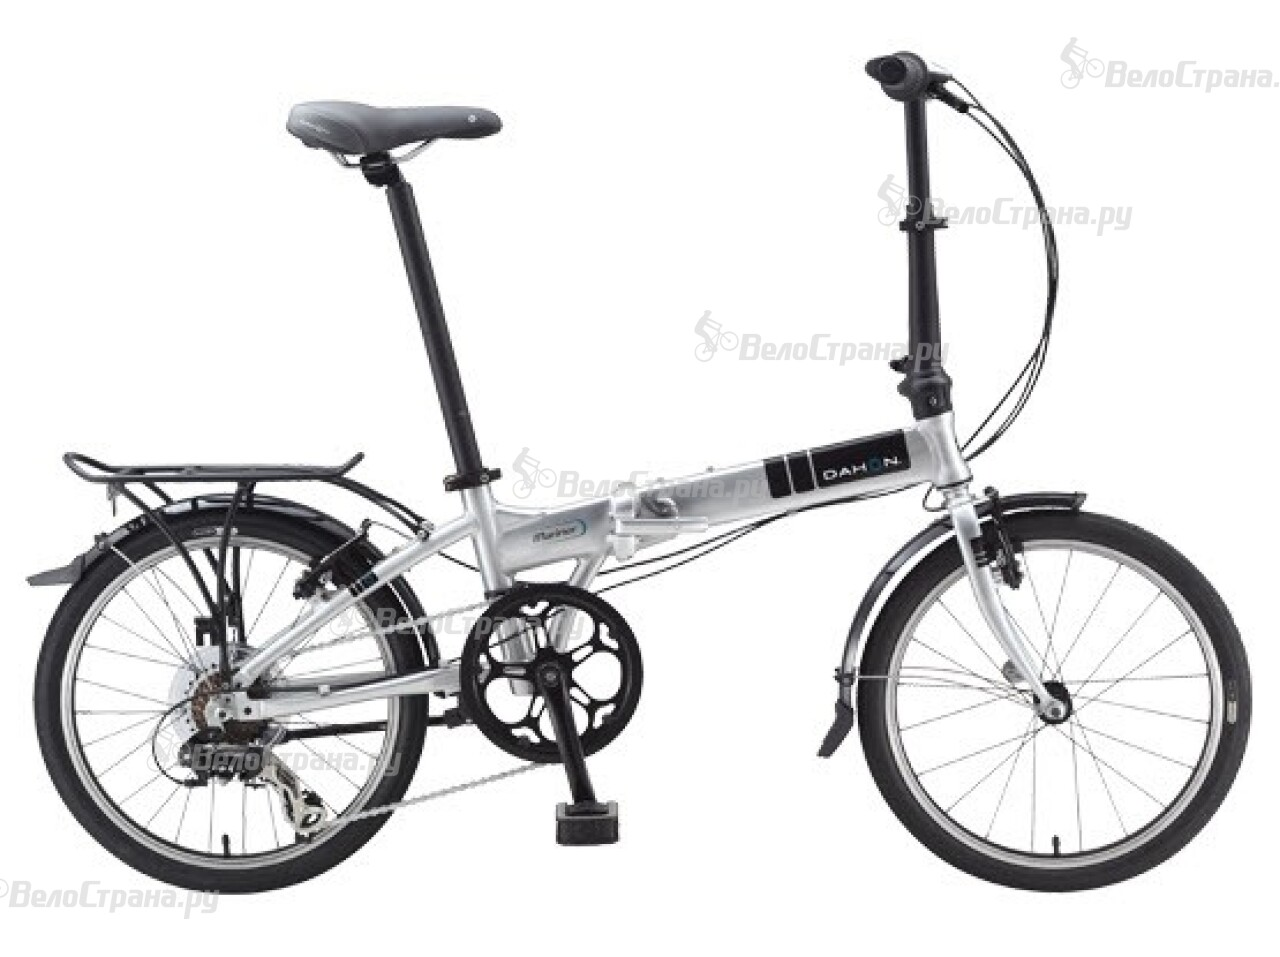 Велосипед Dahon Mariner D7 (2015) велосипед dahon speed d7 2014